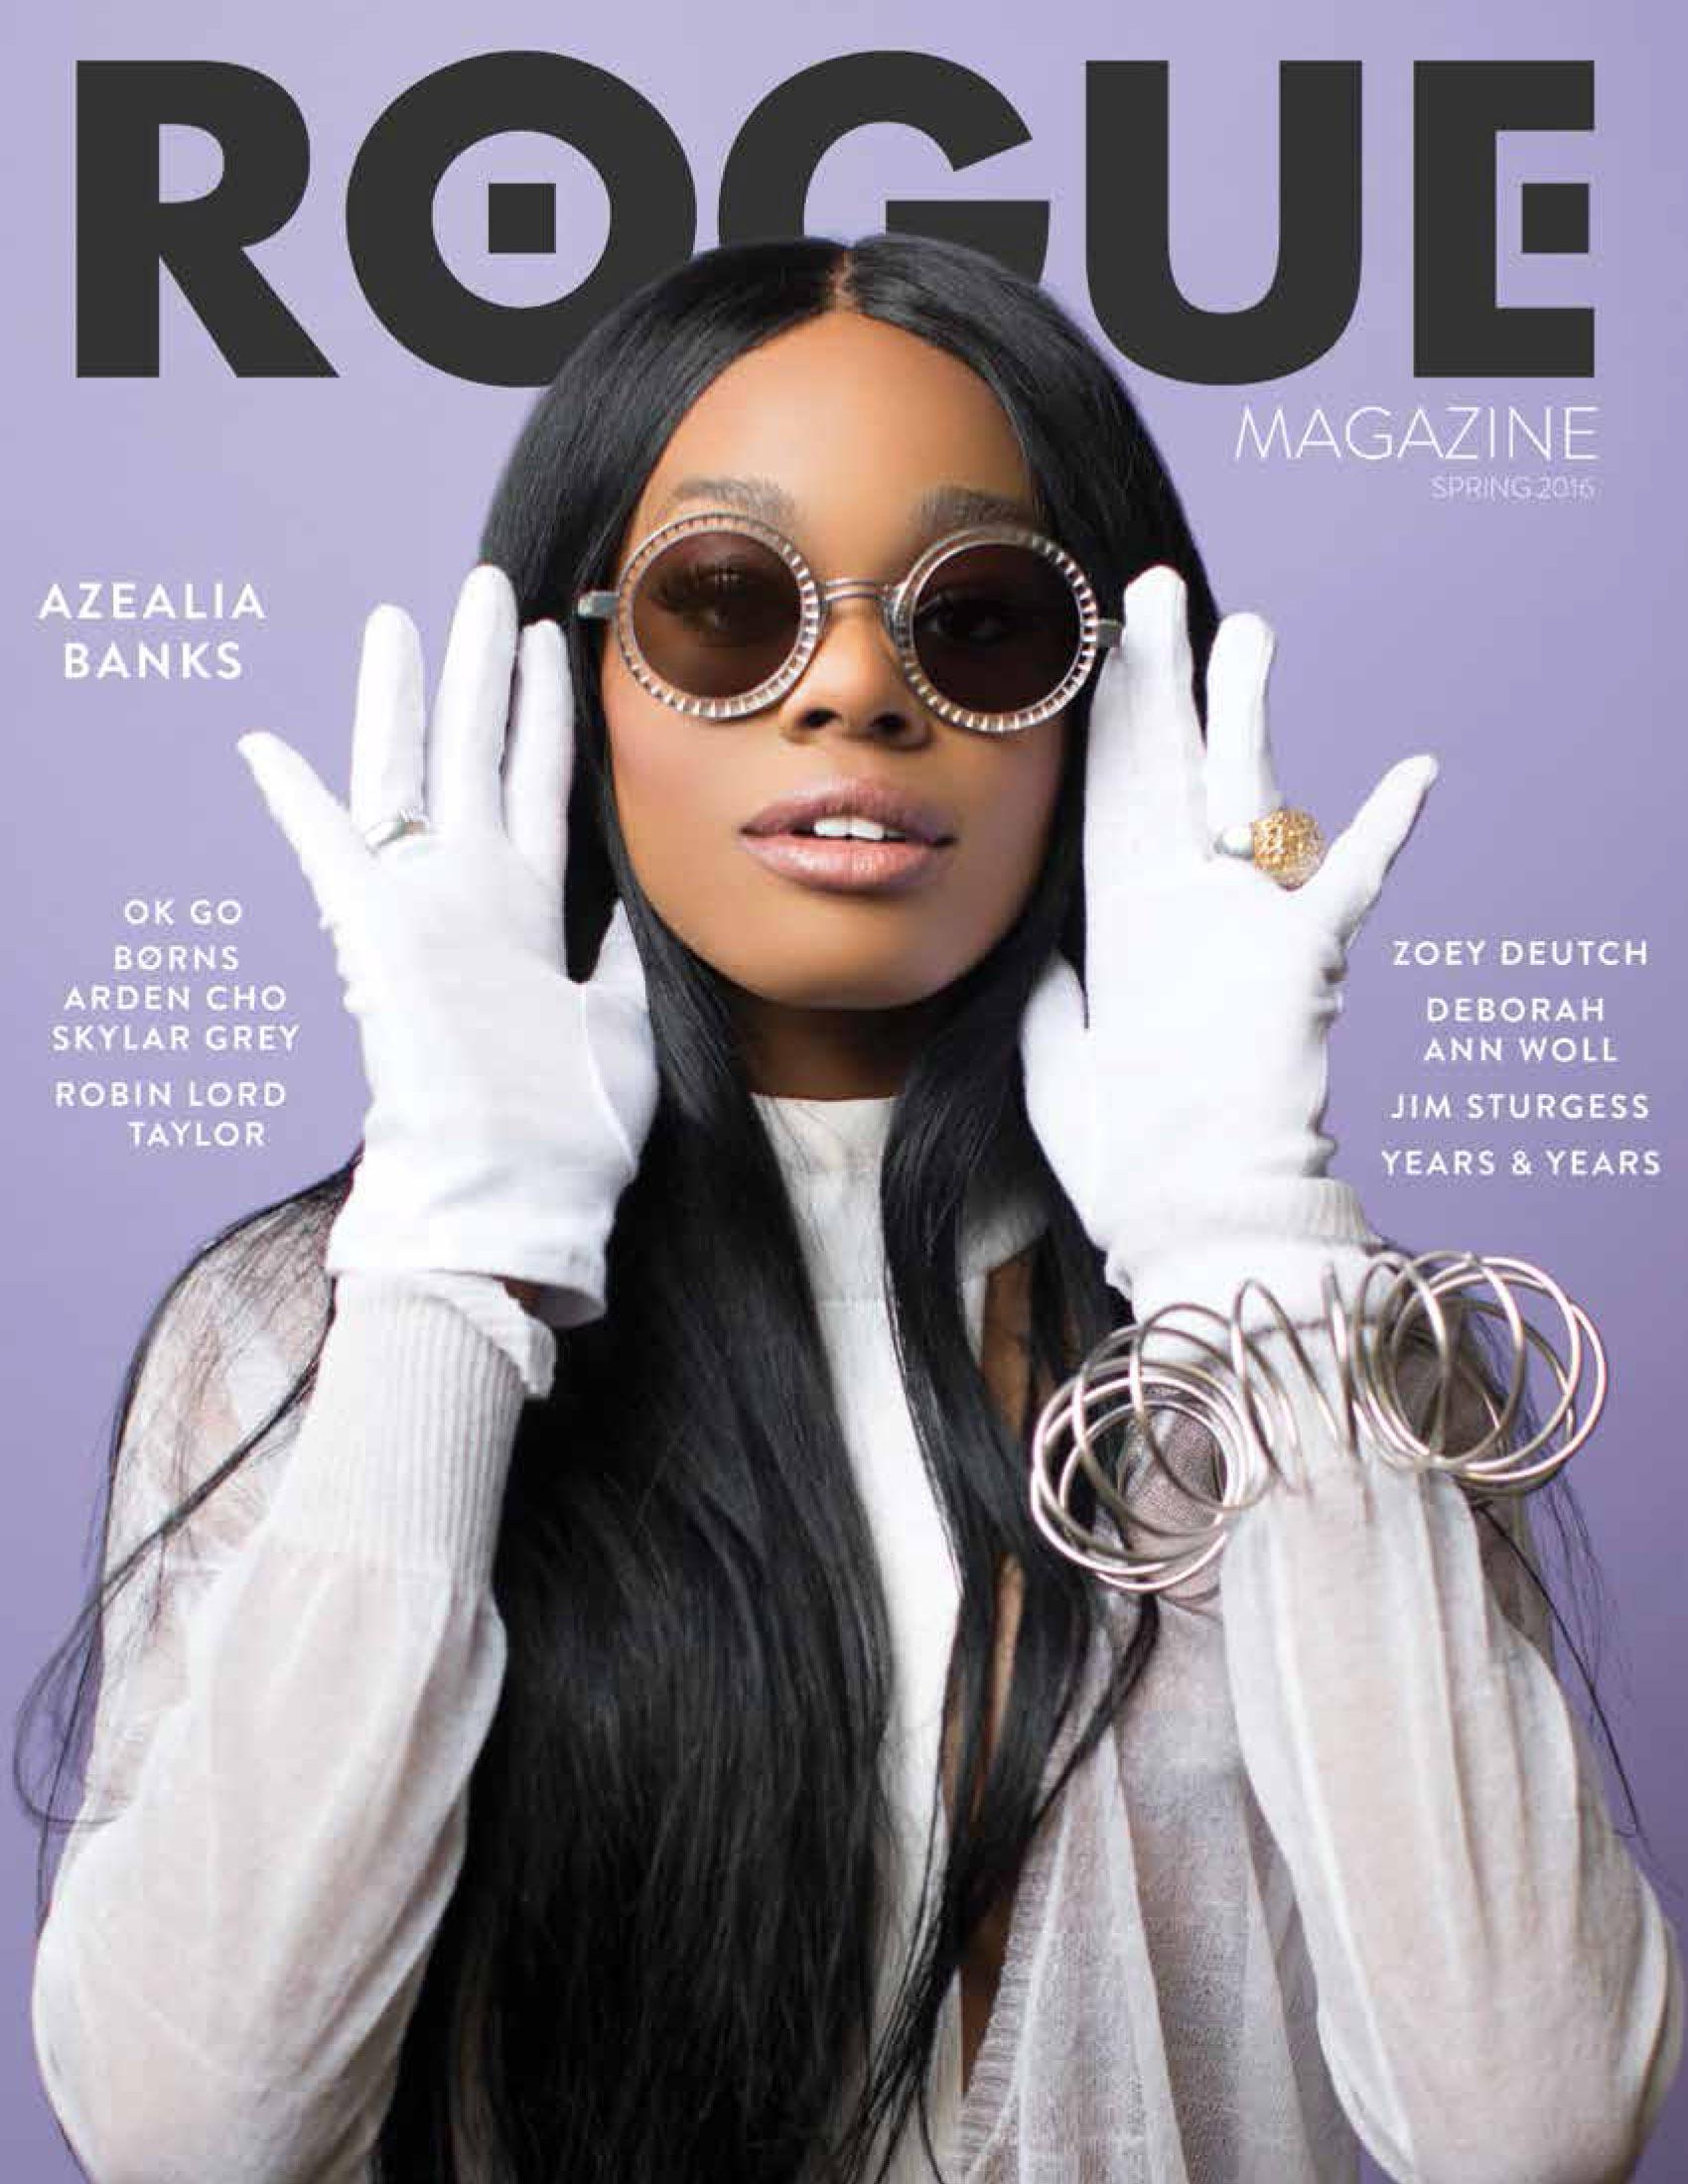 ROGUE Magazine Cover